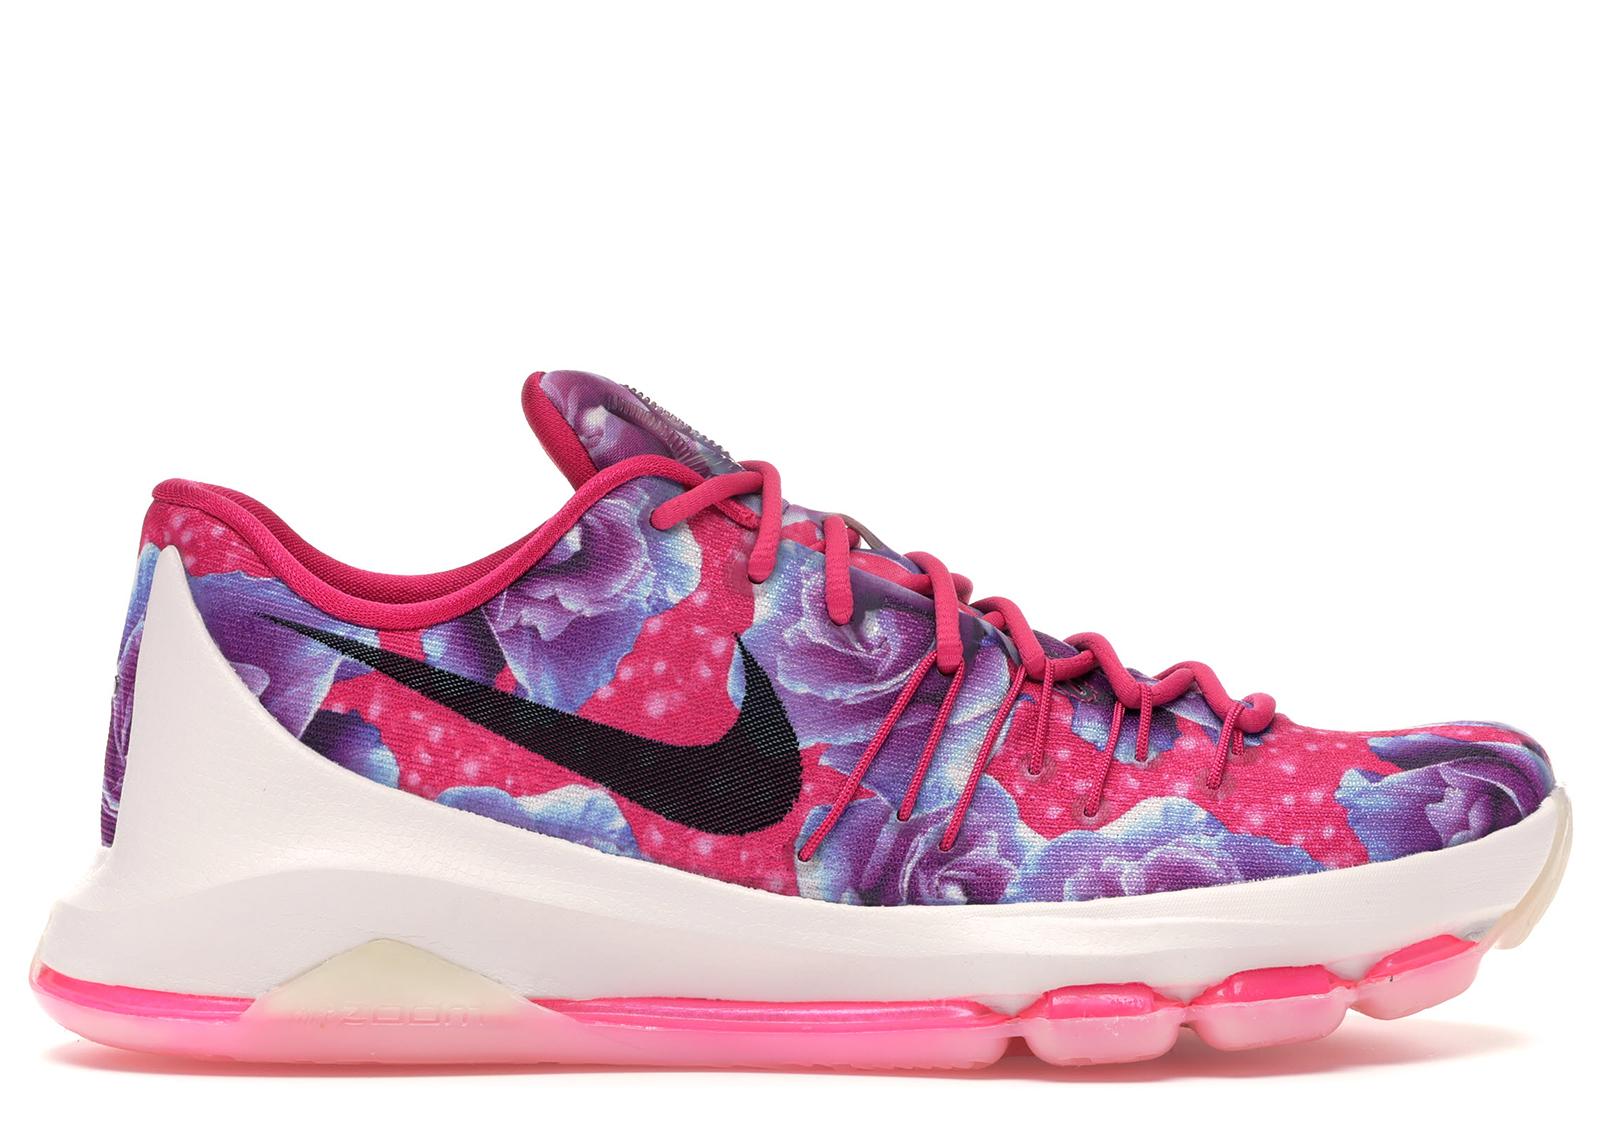 Nike KD 8 Aunt Pearl - 819148-603